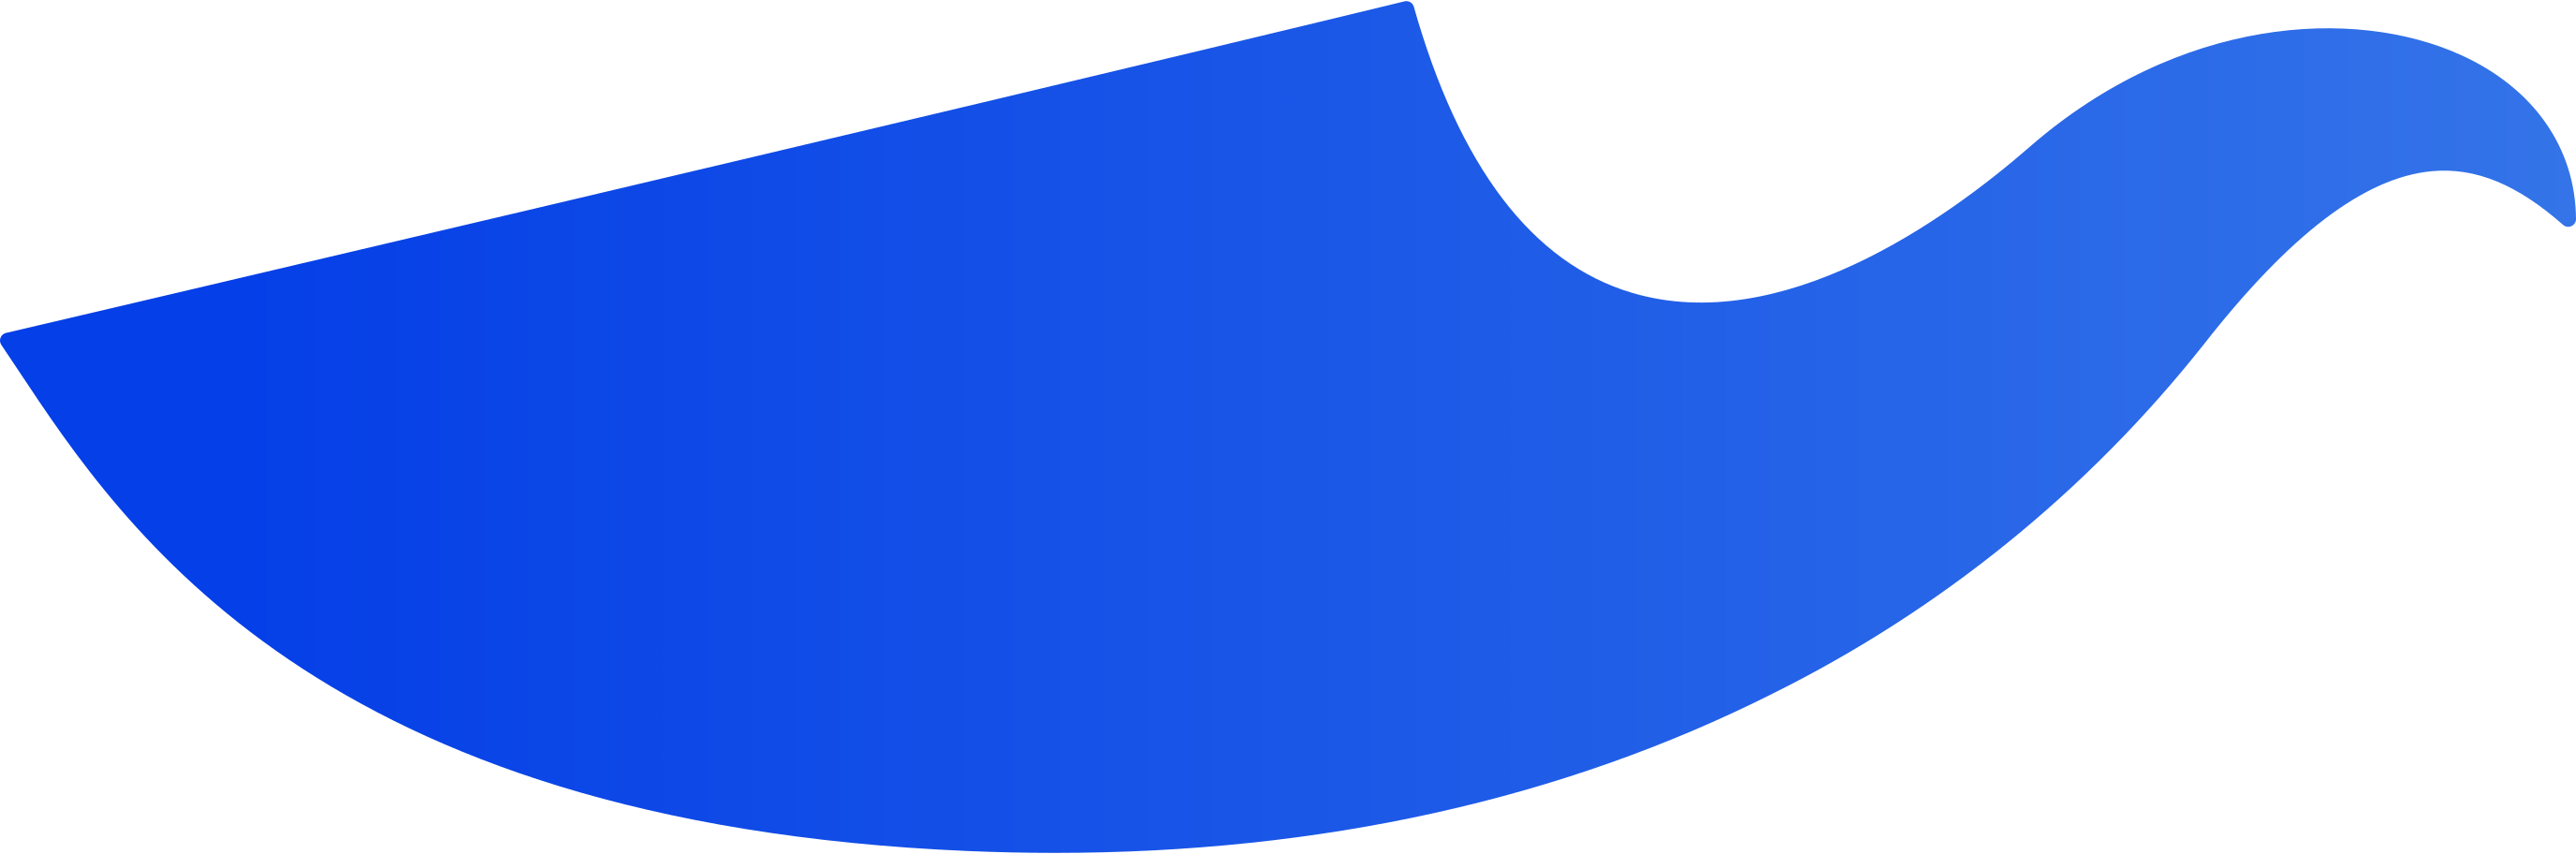 cape Clipart illustration in PNG, SVG